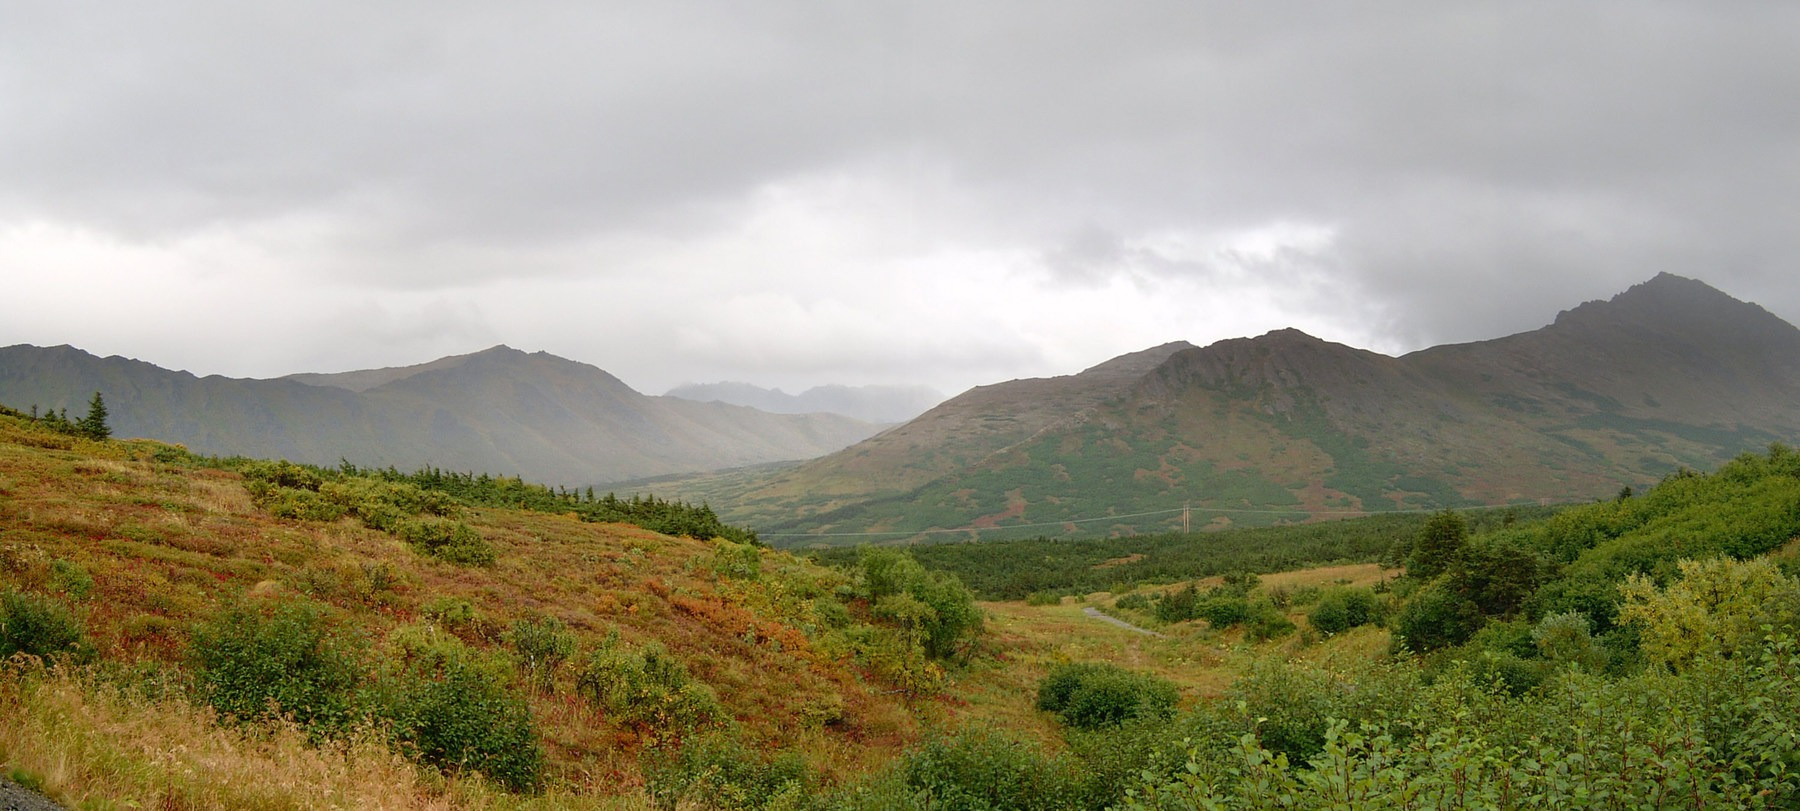 Flattop Mountain Via Glen Alps Trailhead Outdoor Project